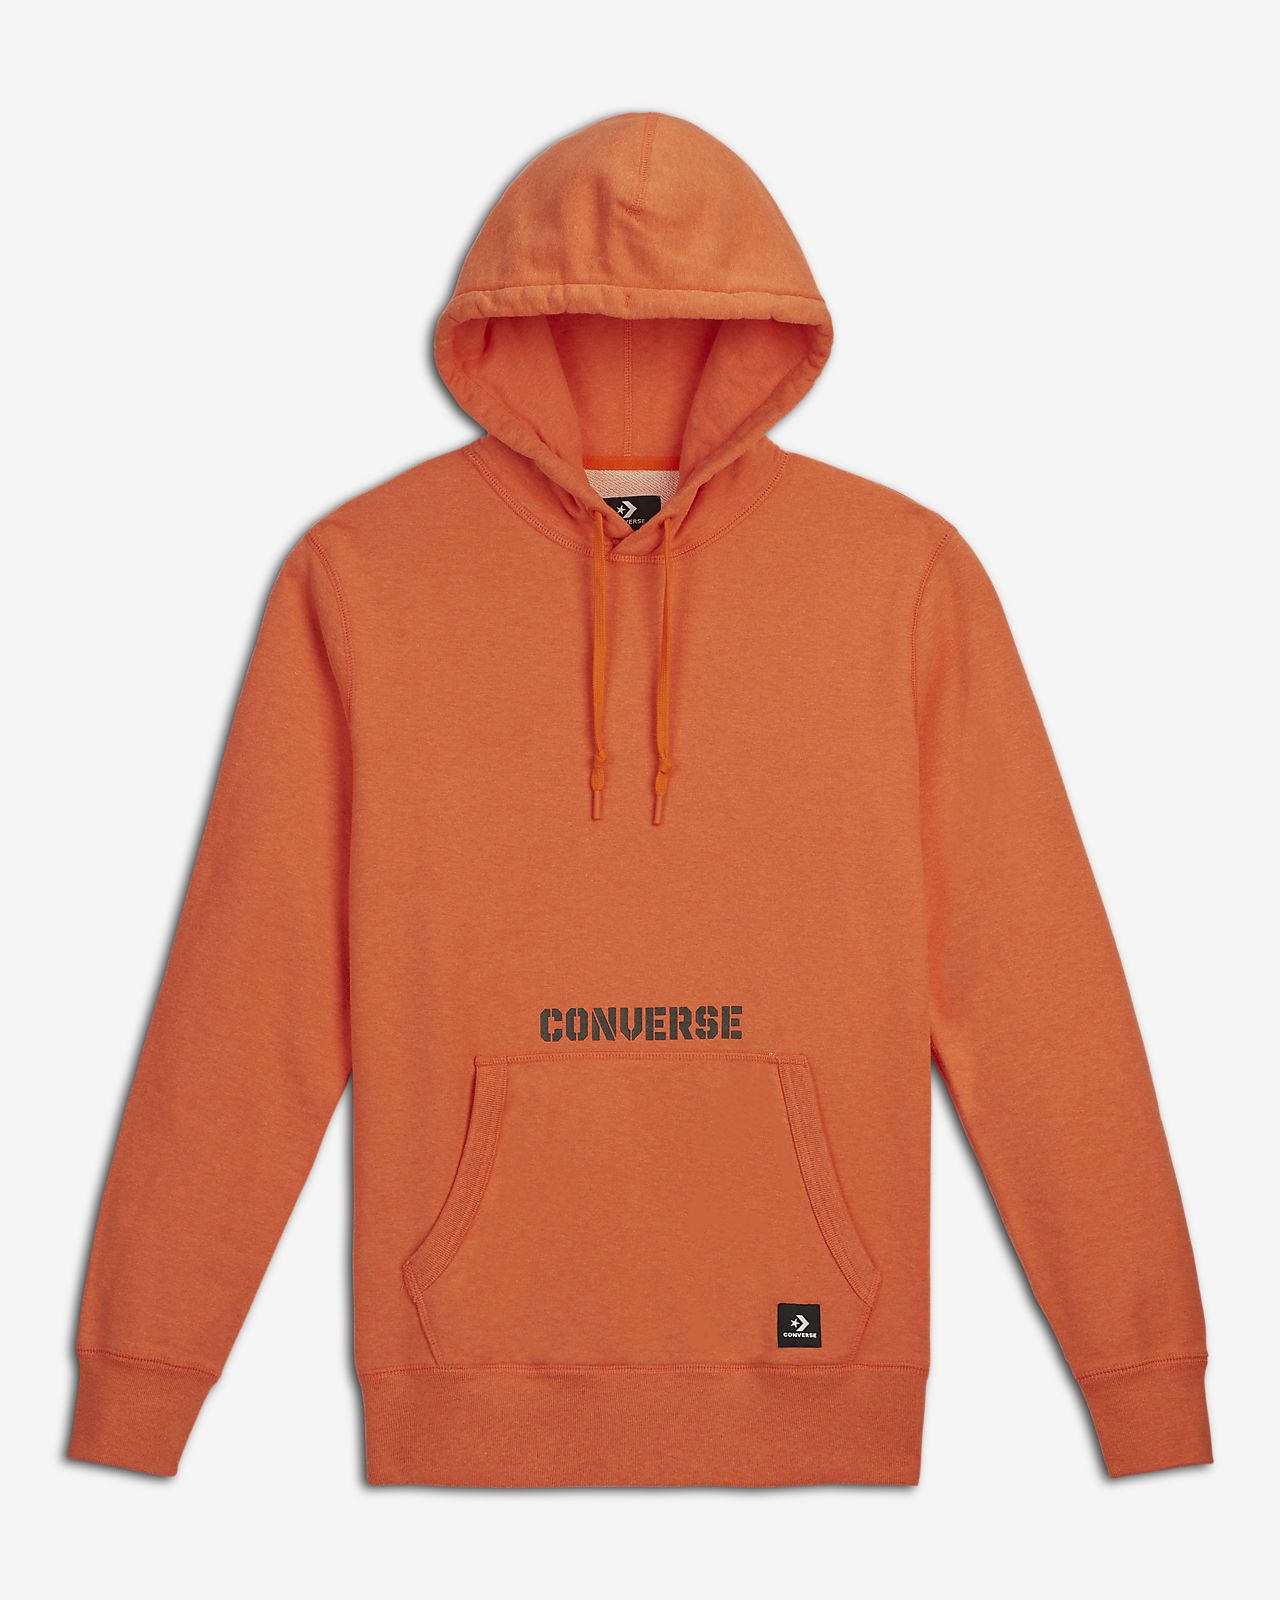 Converse Essentials Reflective Star Chevron  Men's Pullover Hoodie